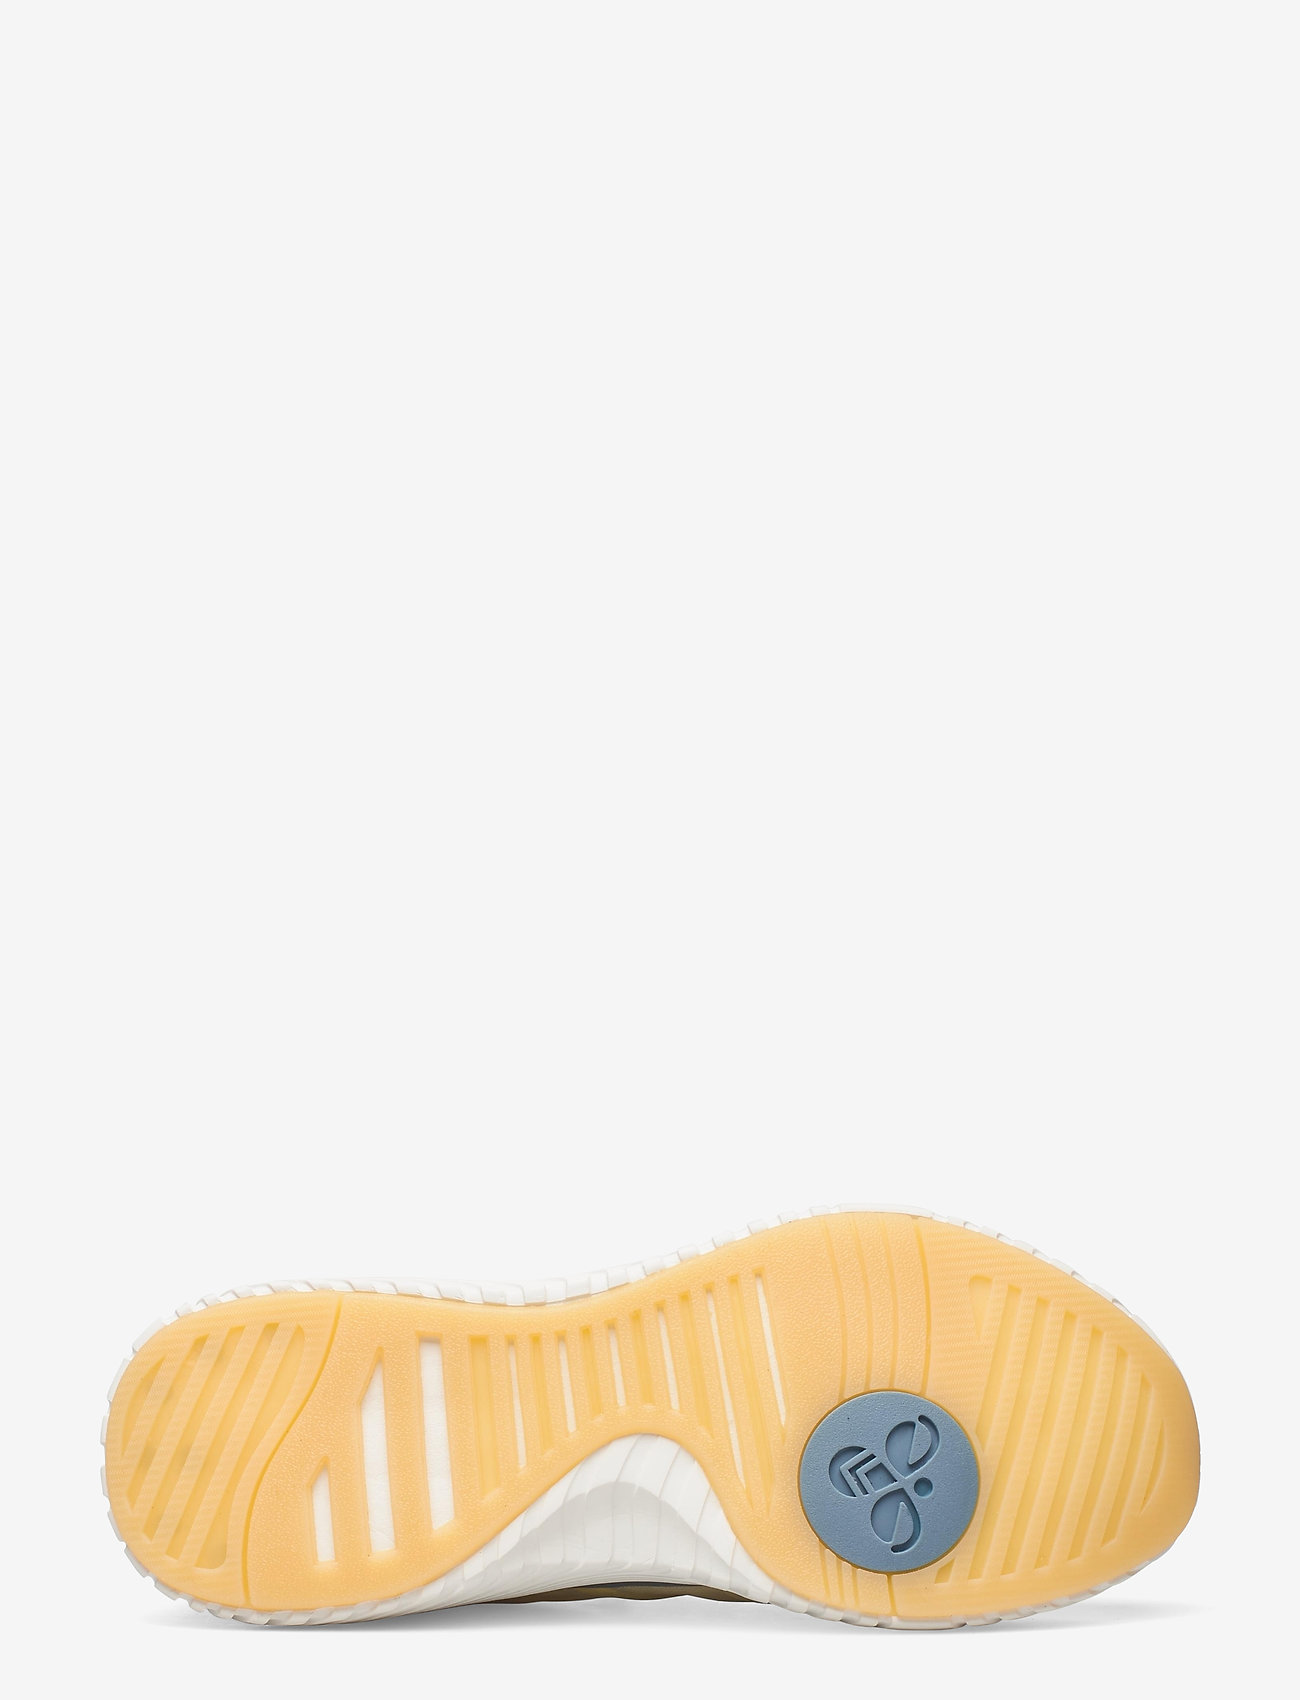 Minneapolis Breaker (Cream Gold) (55.22 €) - Hummel tJpRo